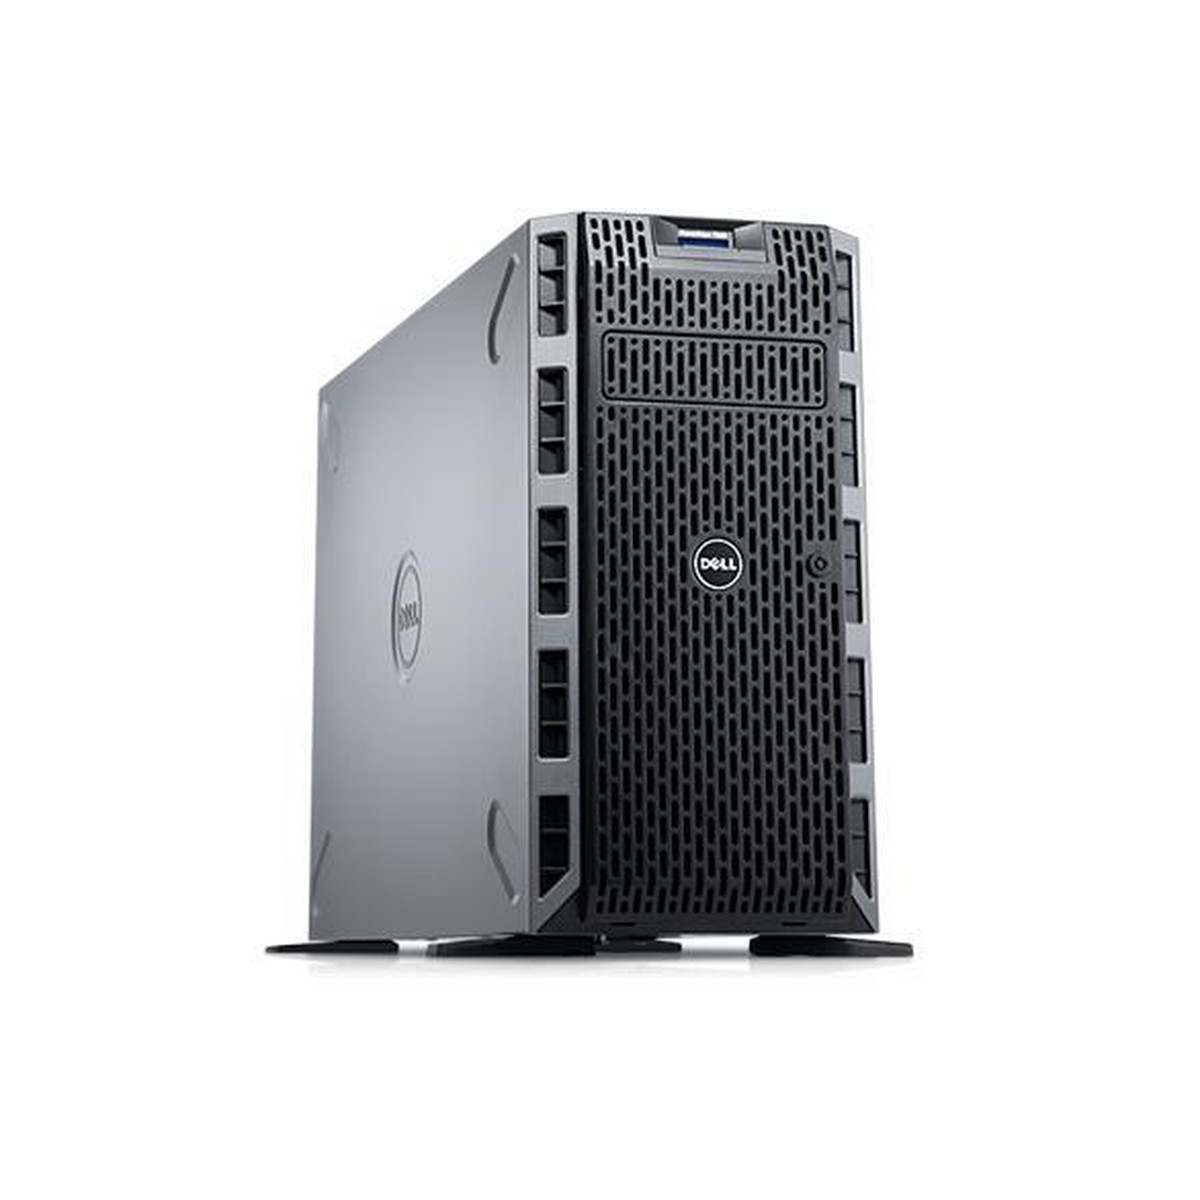 PAMIEC SAMSUNG/HYNIX 1GB 1Rx8 PC3-8500E